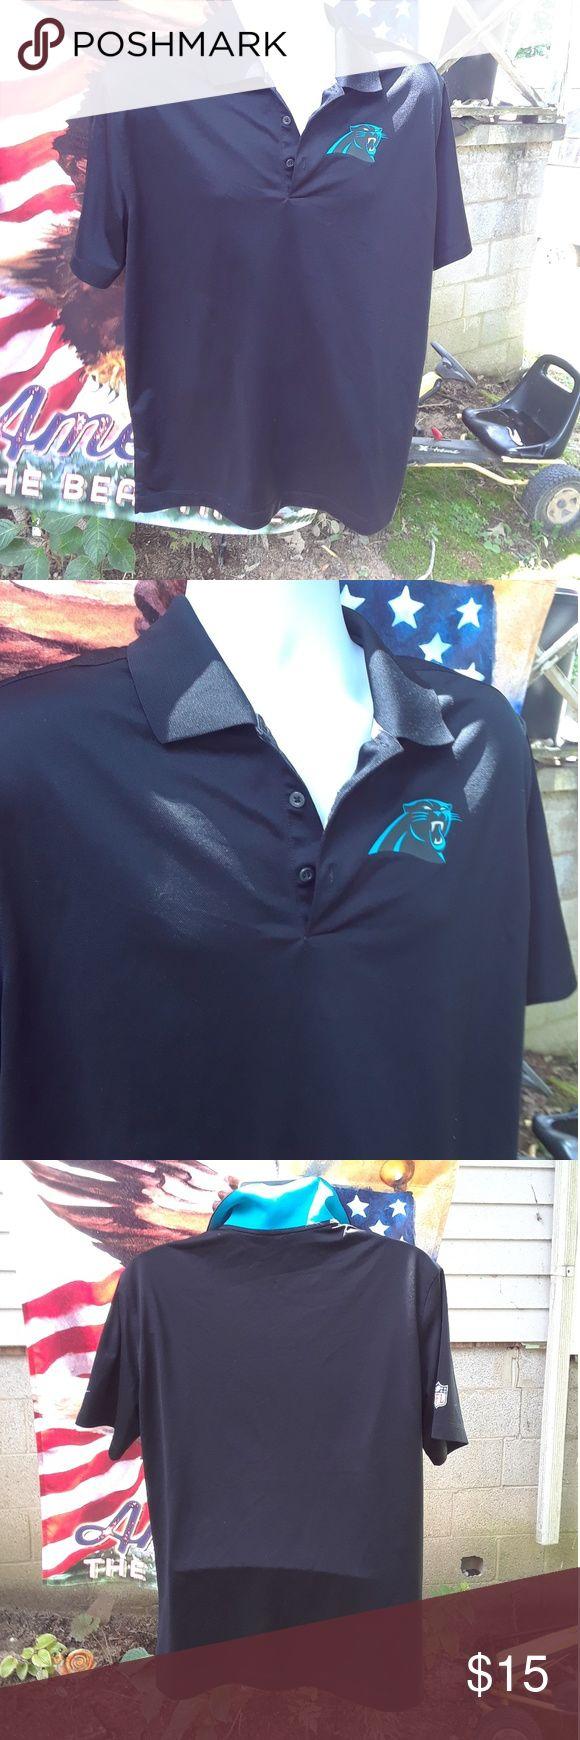 Selling this Caroline Panthers men's shirt size Large on Poshmark! My username is: alicesales. #shopmycloset #poshmark #fashion #shopping #style #forsale #NFL #Other